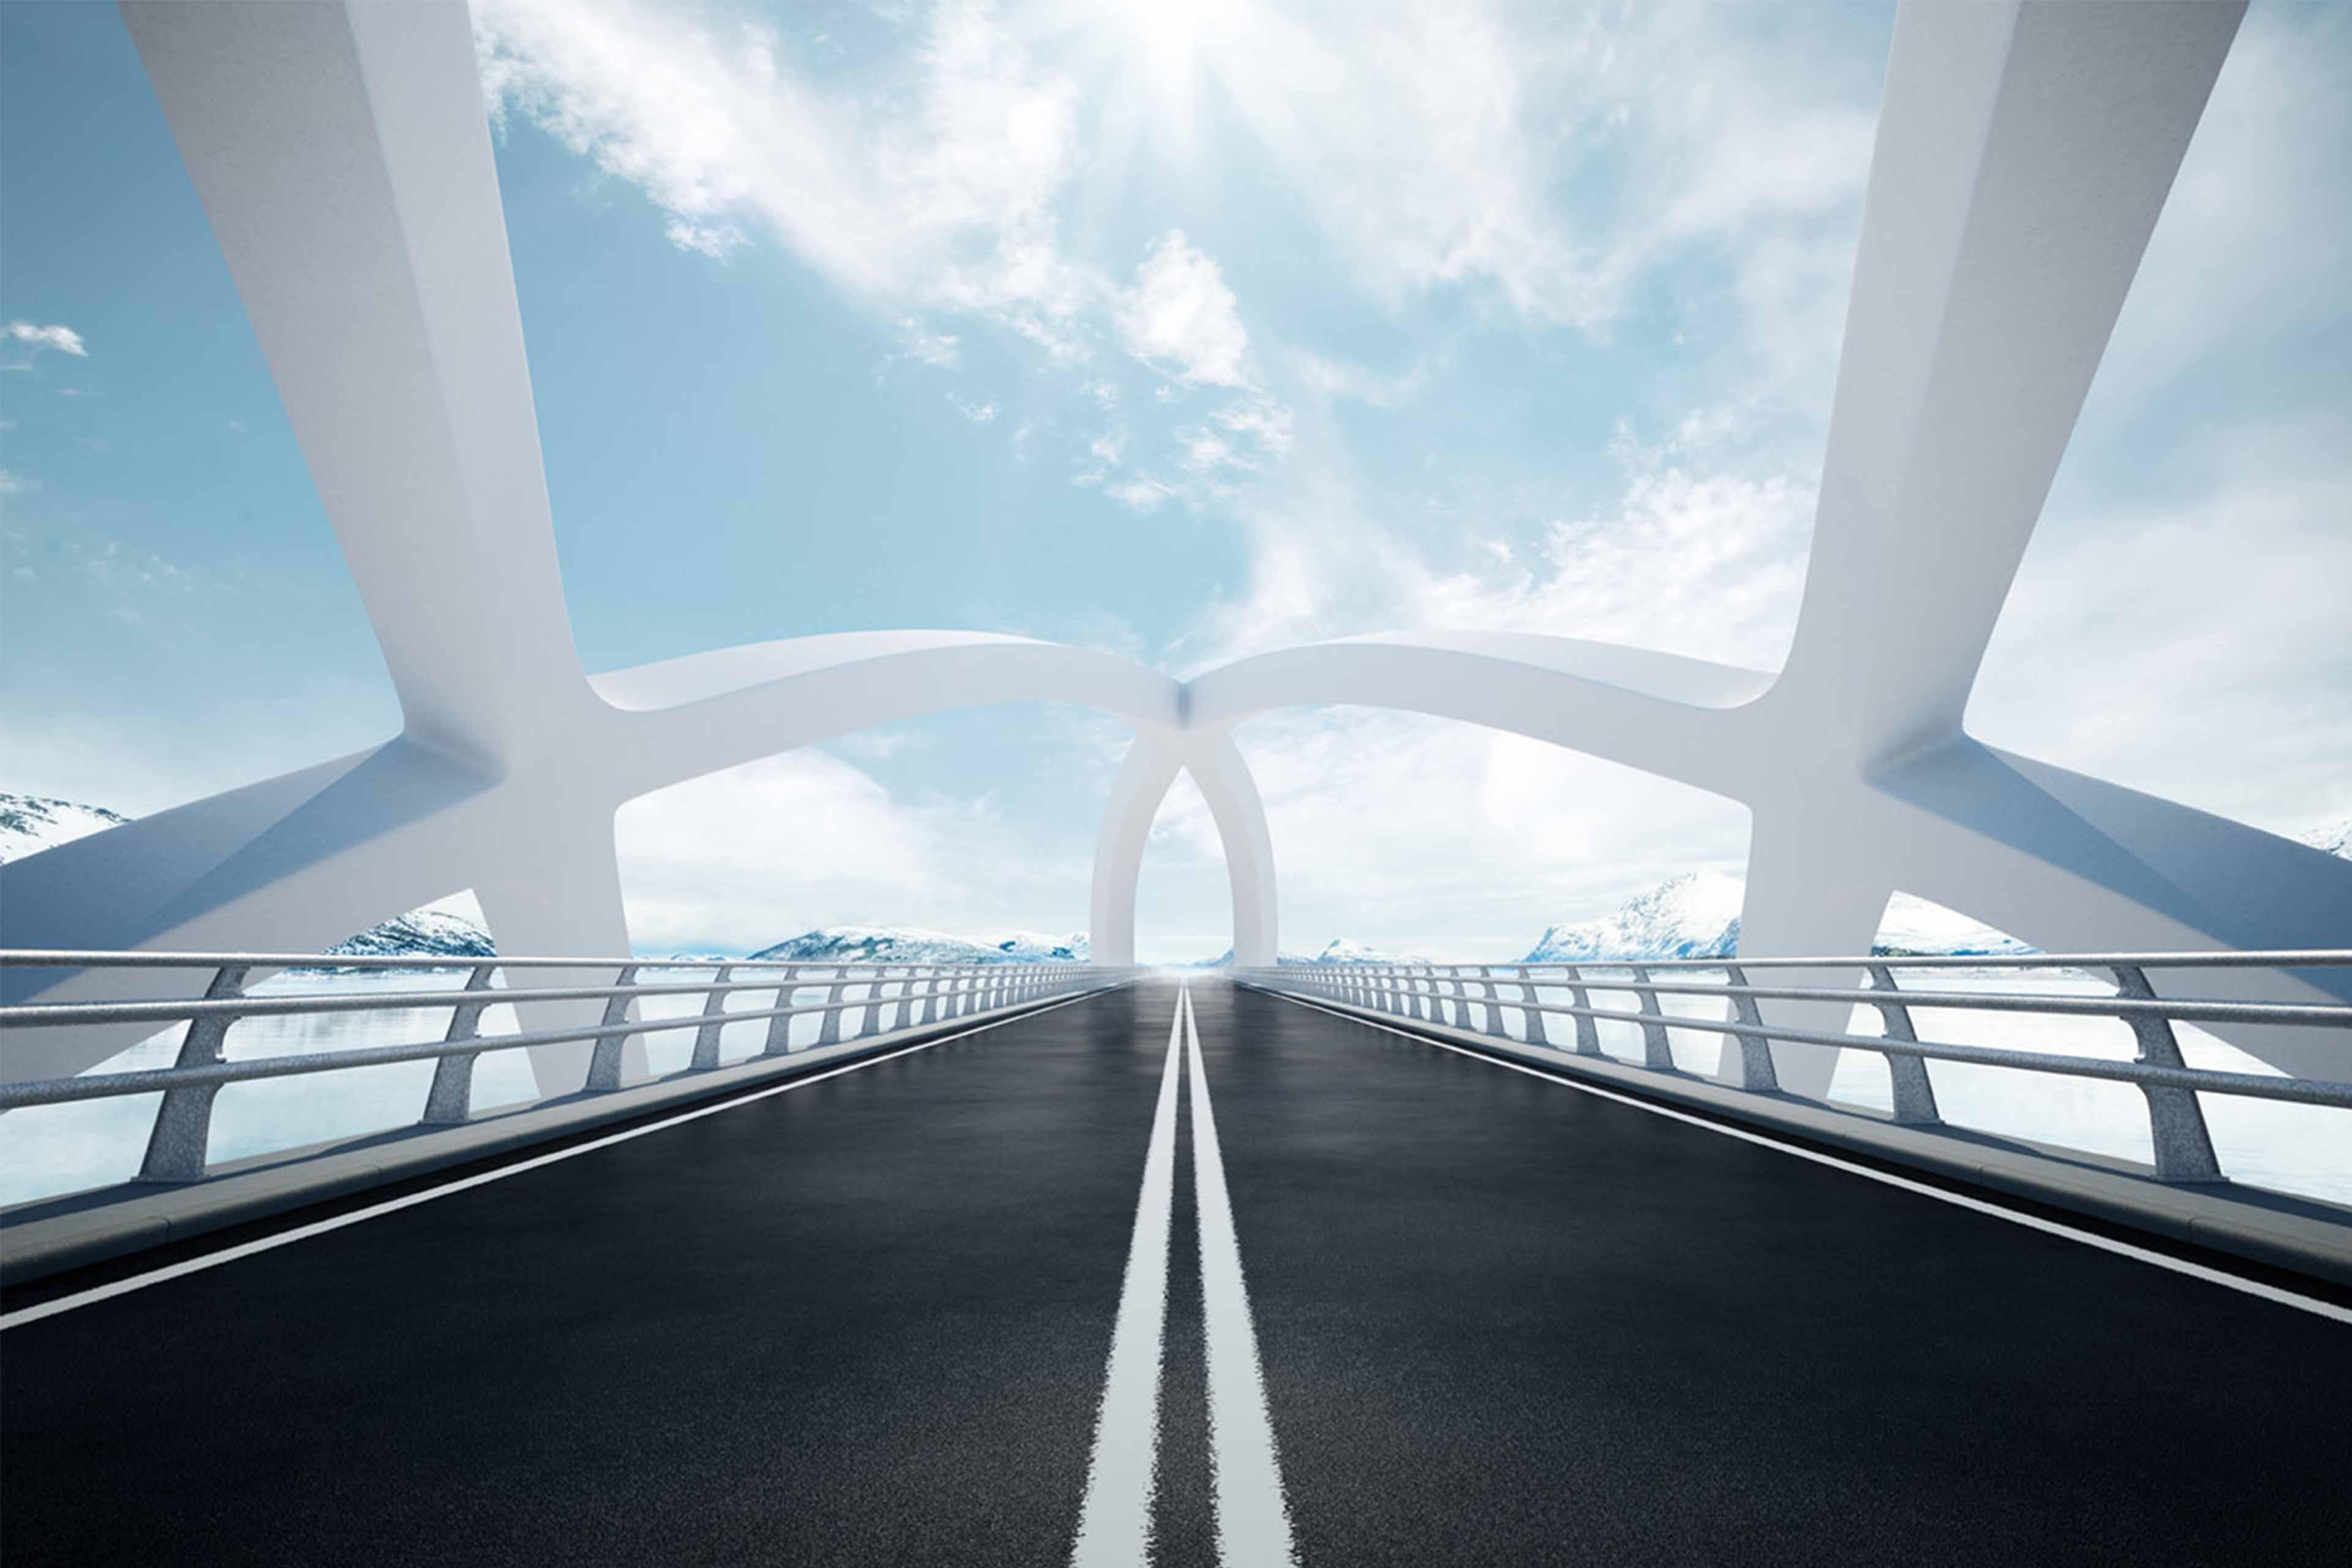 ey-bridge-eoy-version1-210411